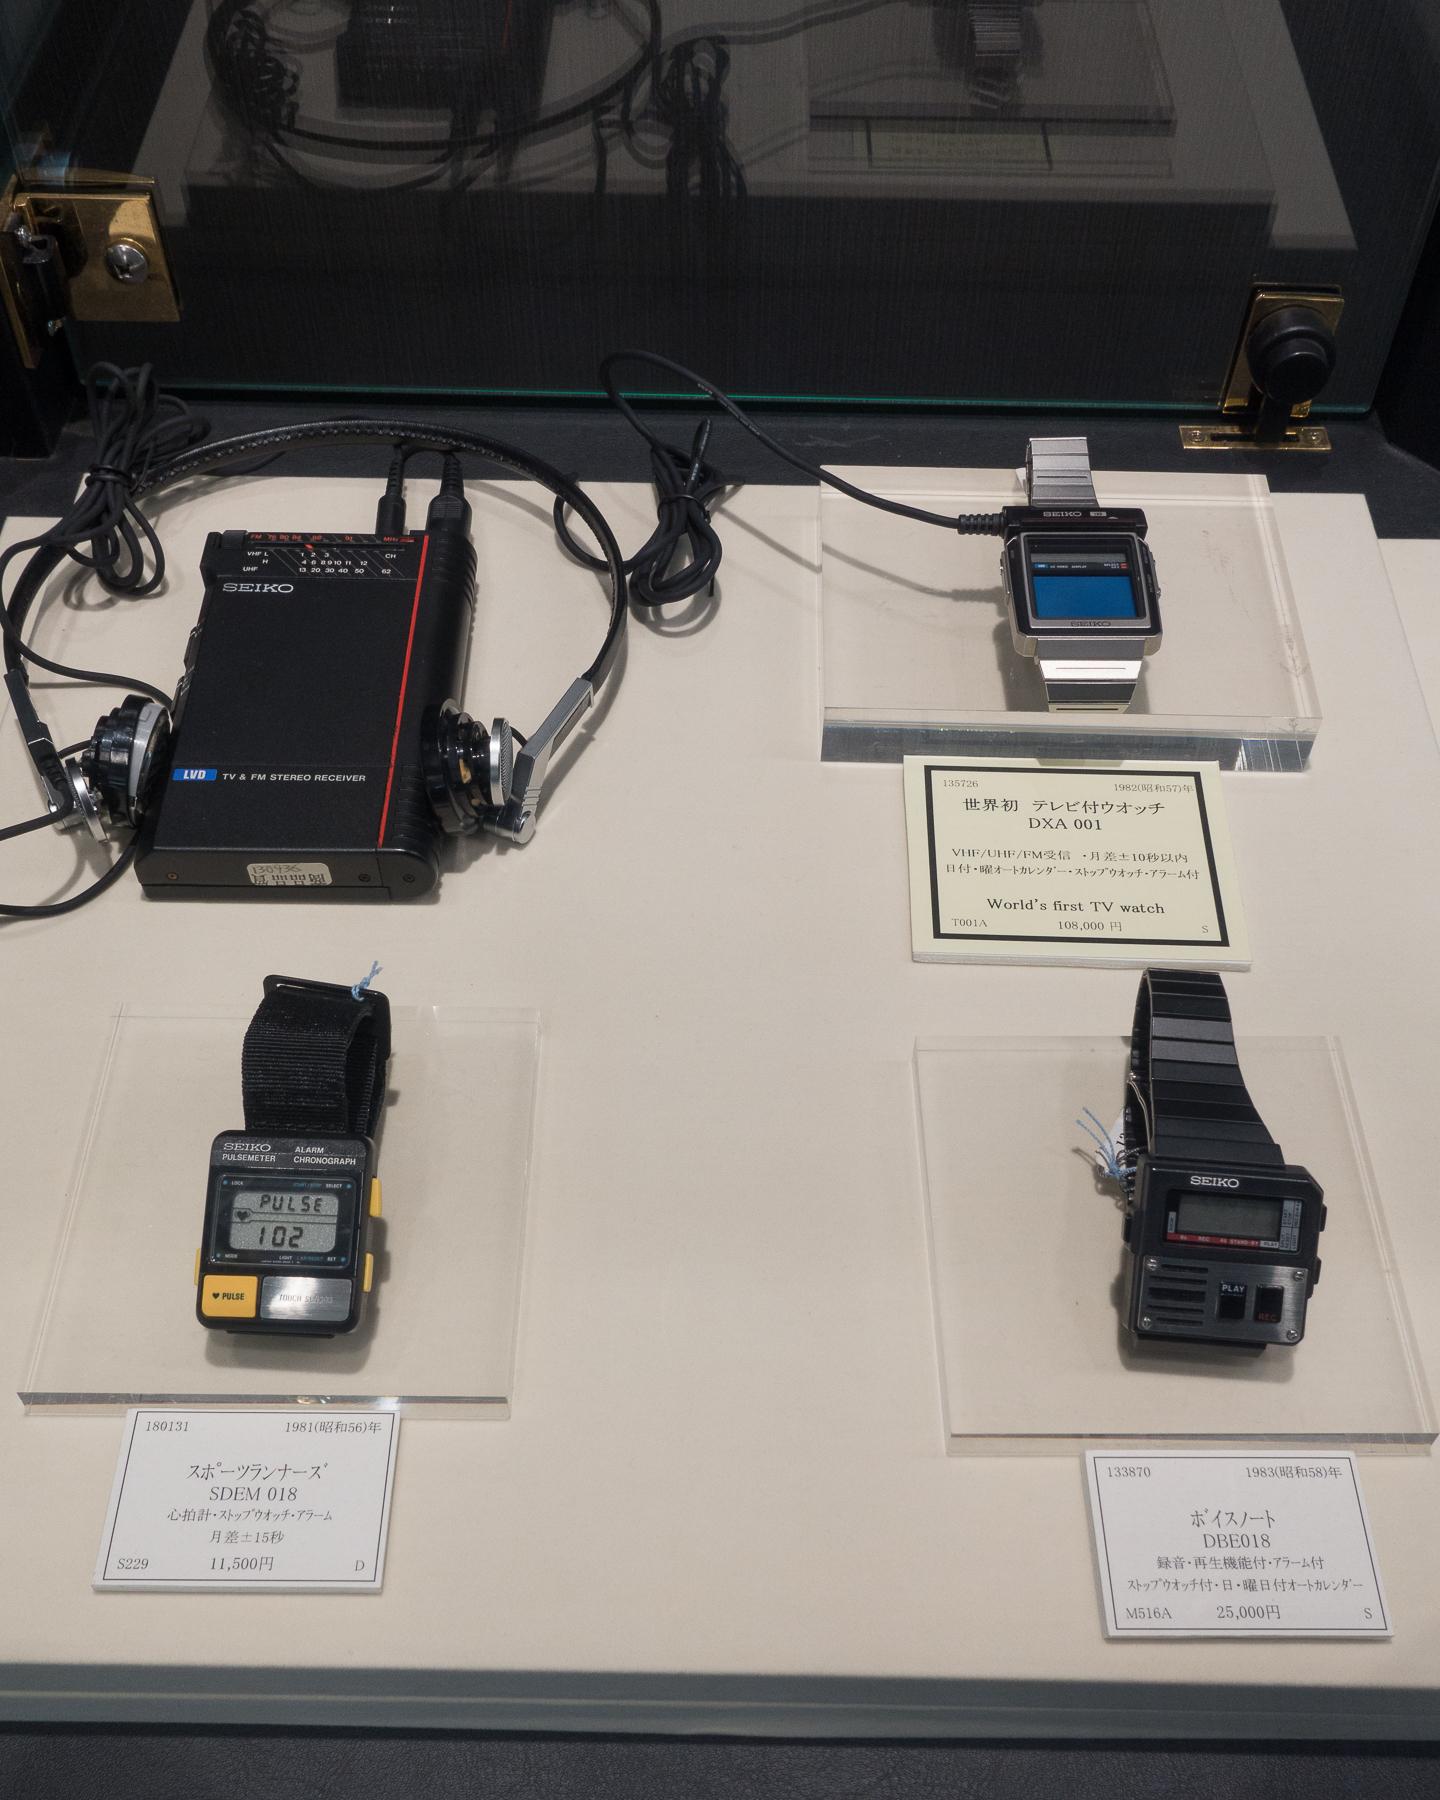 T001 TV, S229 Pulse Meter & M516 Audio Recorder